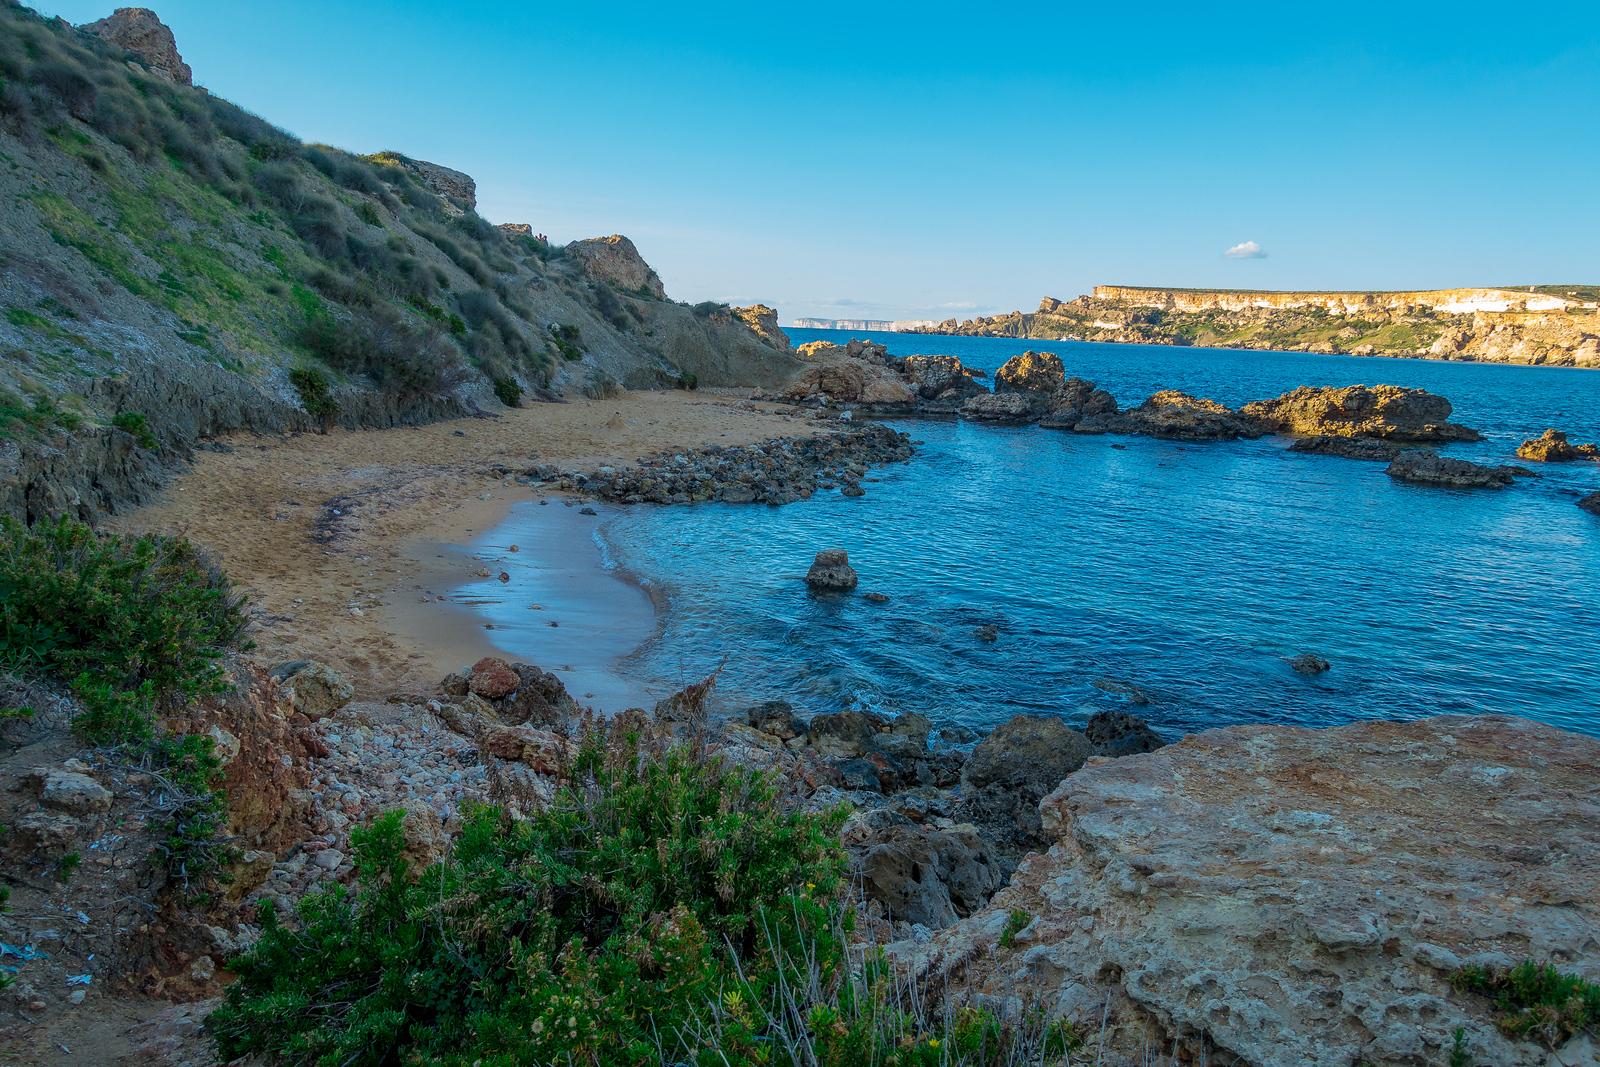 GOTO Malta Car Hire - Ghan Tuffieha Bay, Malta